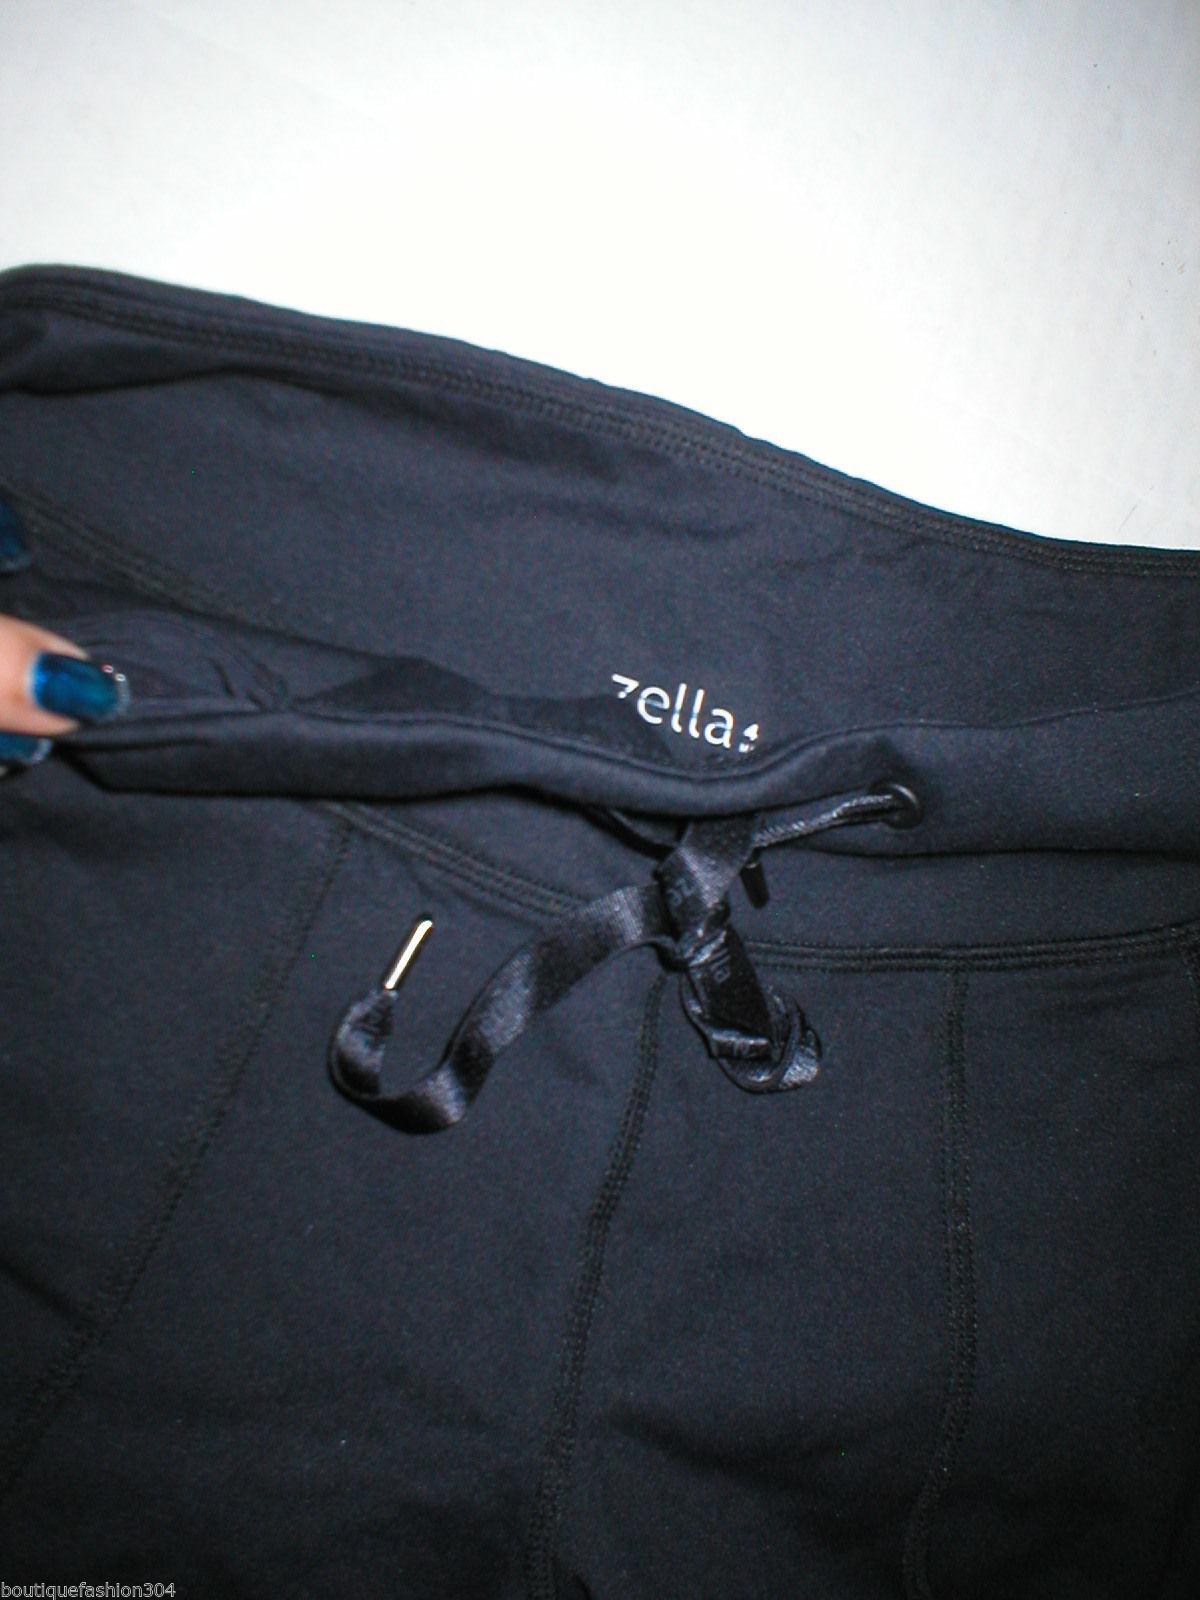 Women New Zella Nordstrom Pants Gym 0 Black Crop Capri Soul 2 Barre Yoga Pilate image 3